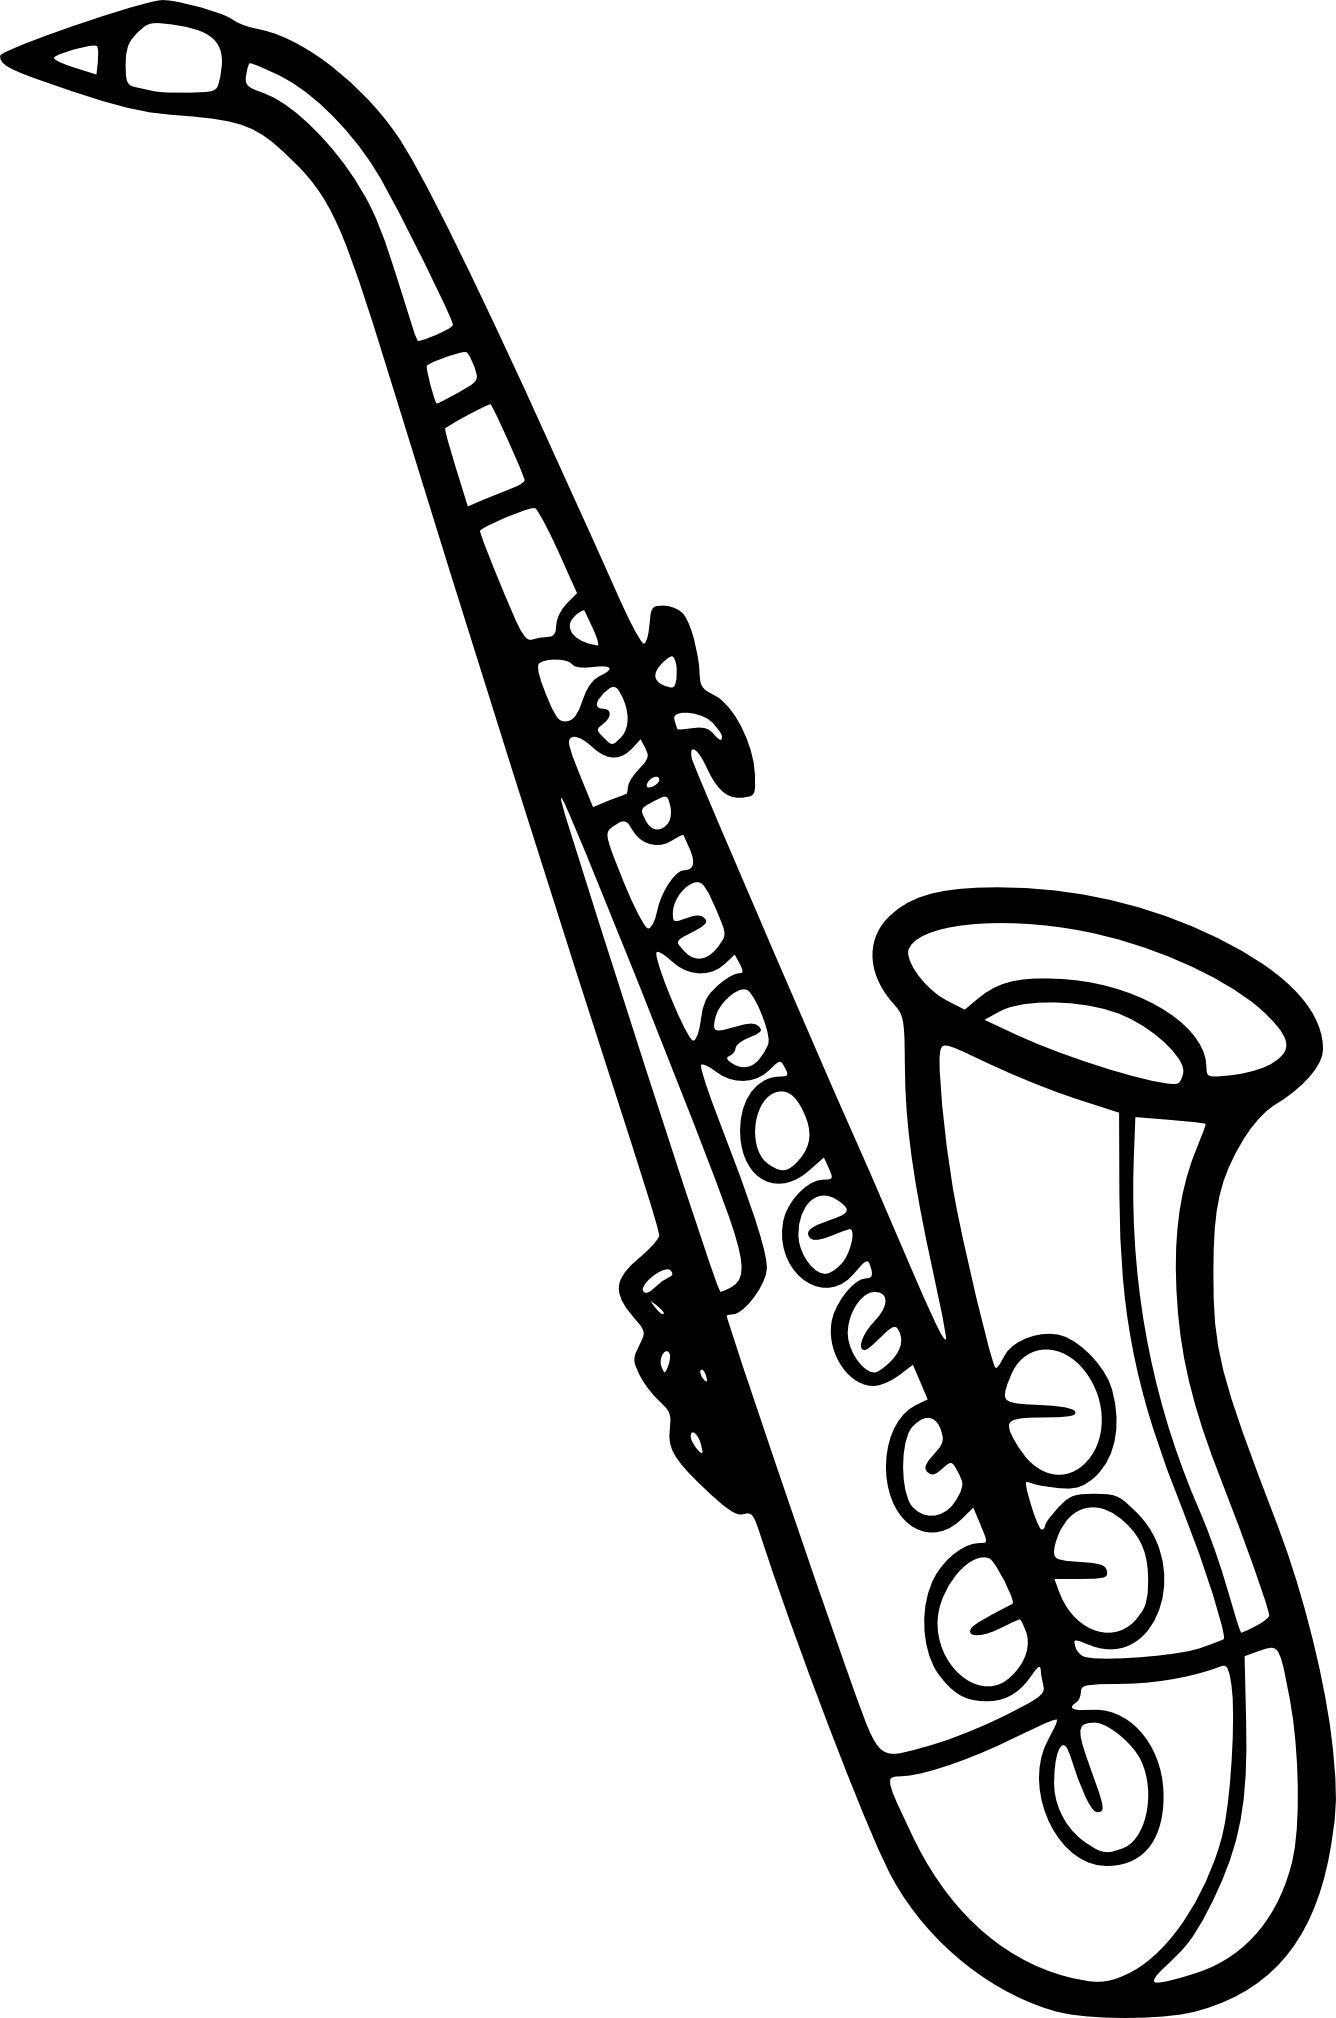 Coloriage saxophone